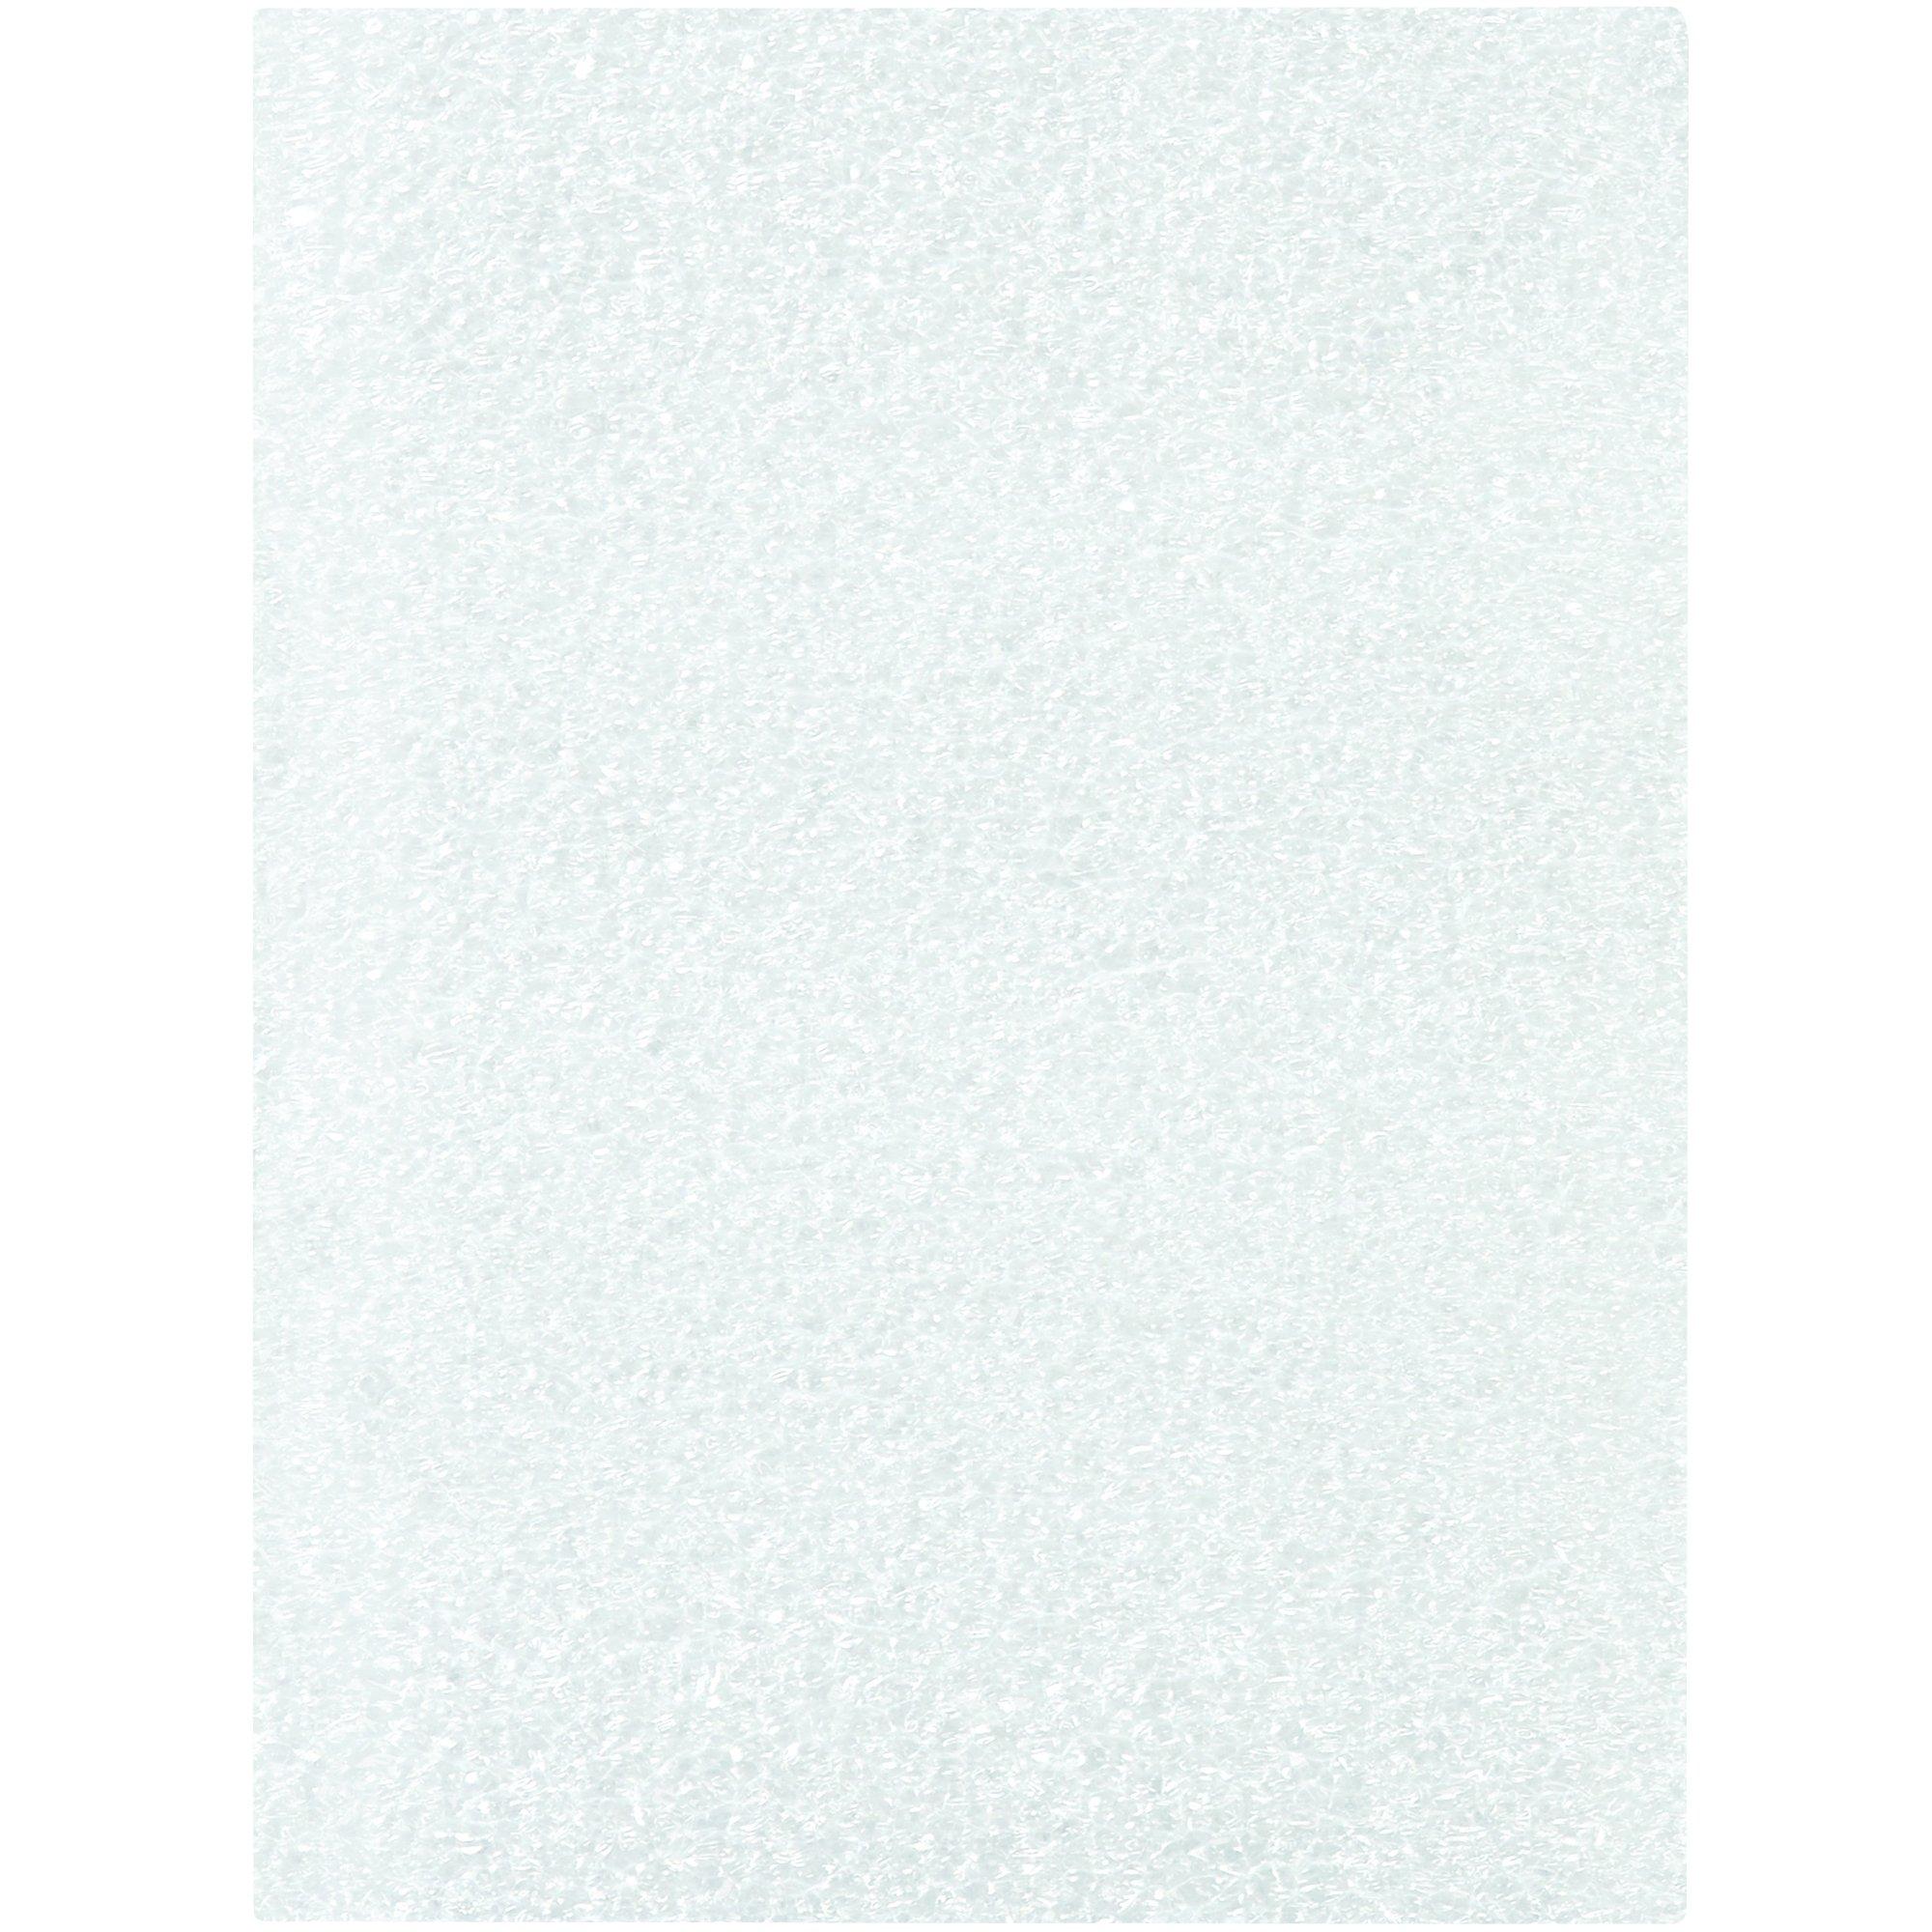 BOX USA BFP34 Flush Cut Foam Pouches, 3'' x 4'', White (Pack of 500)